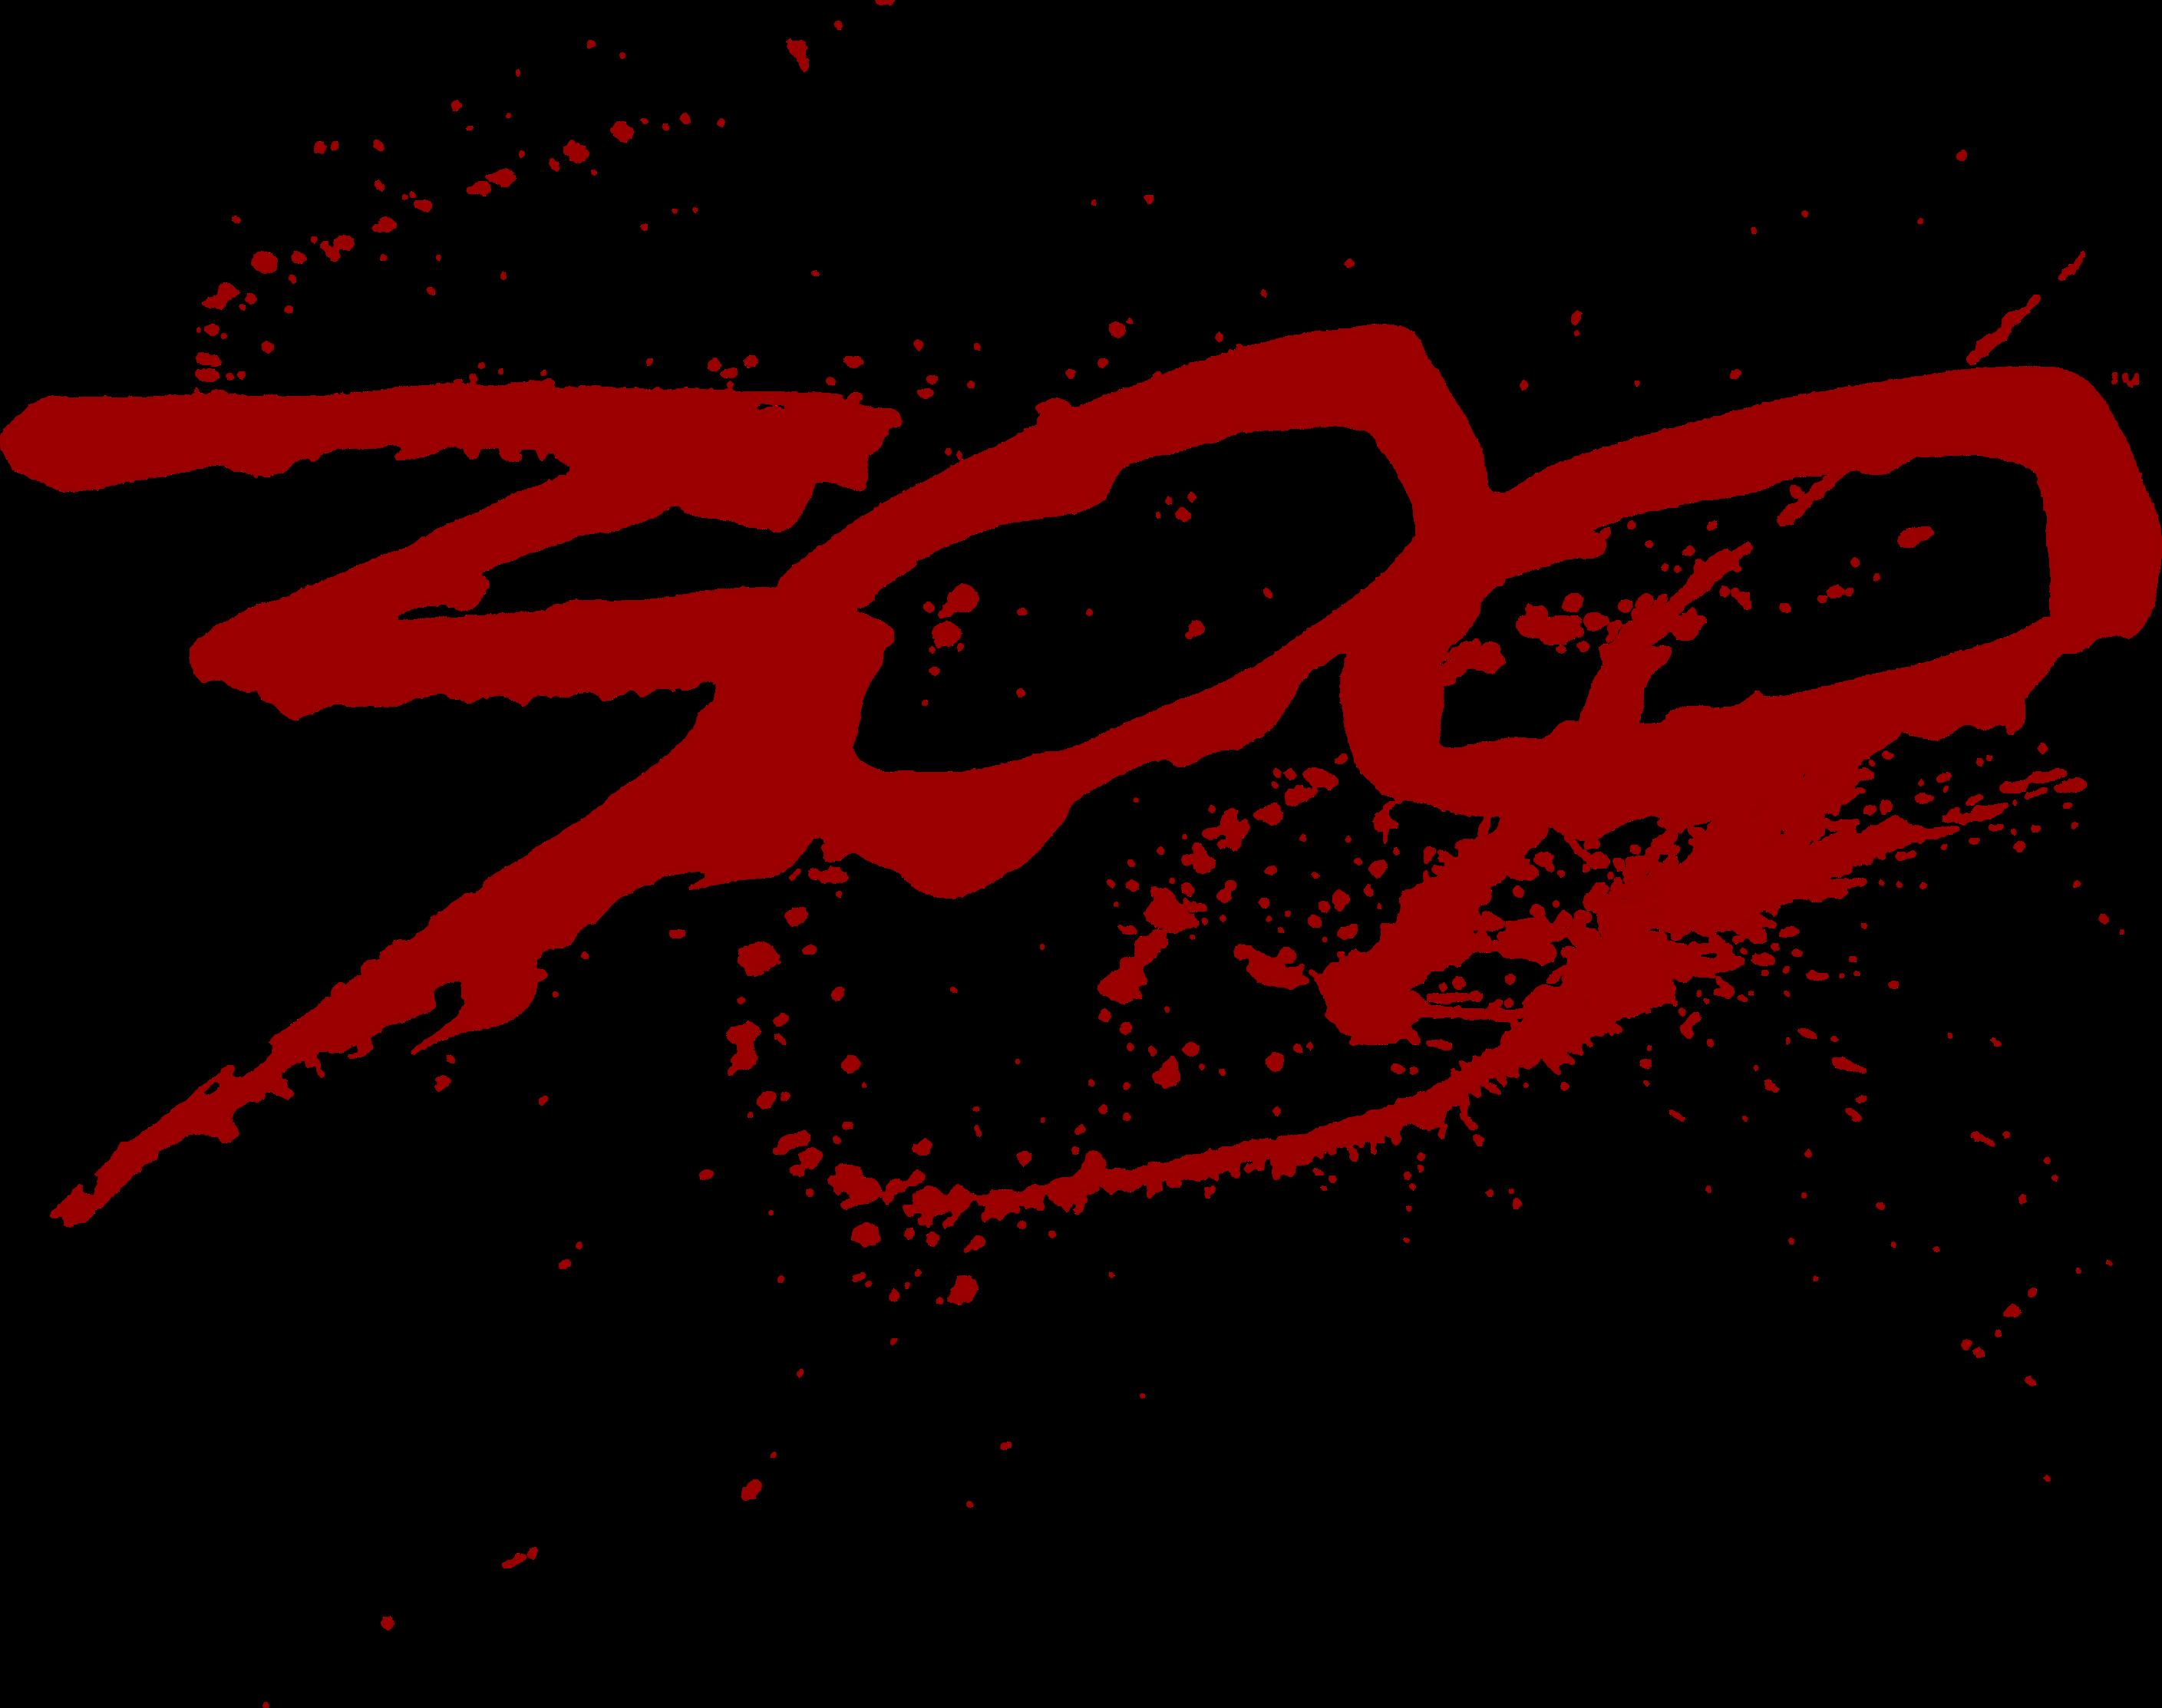 Image result for 300 film logo | Film logo, Image, Film